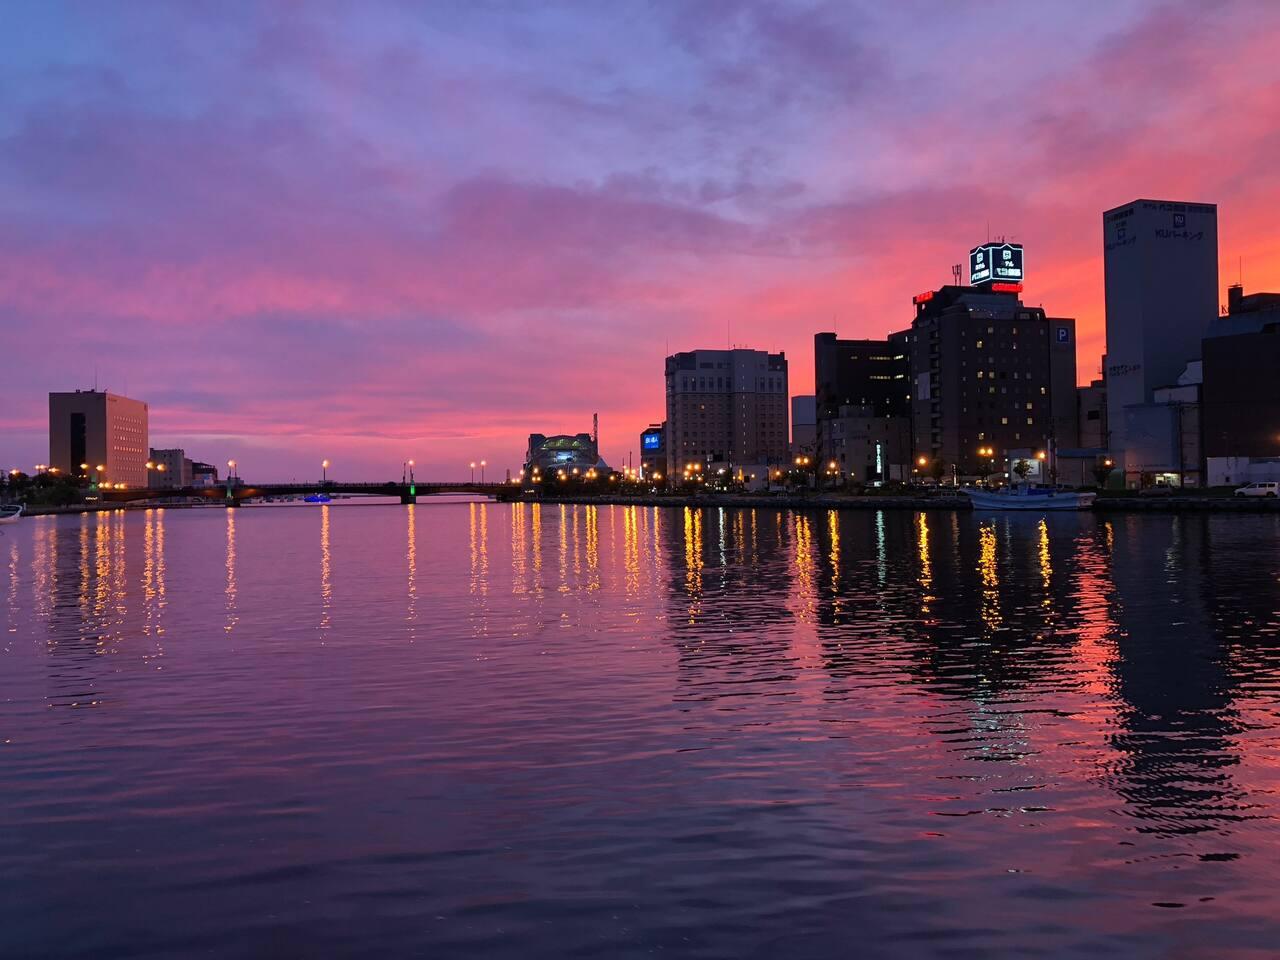 Sunset sky at Nusamai Bridge 幣舞橋の夕焼け空